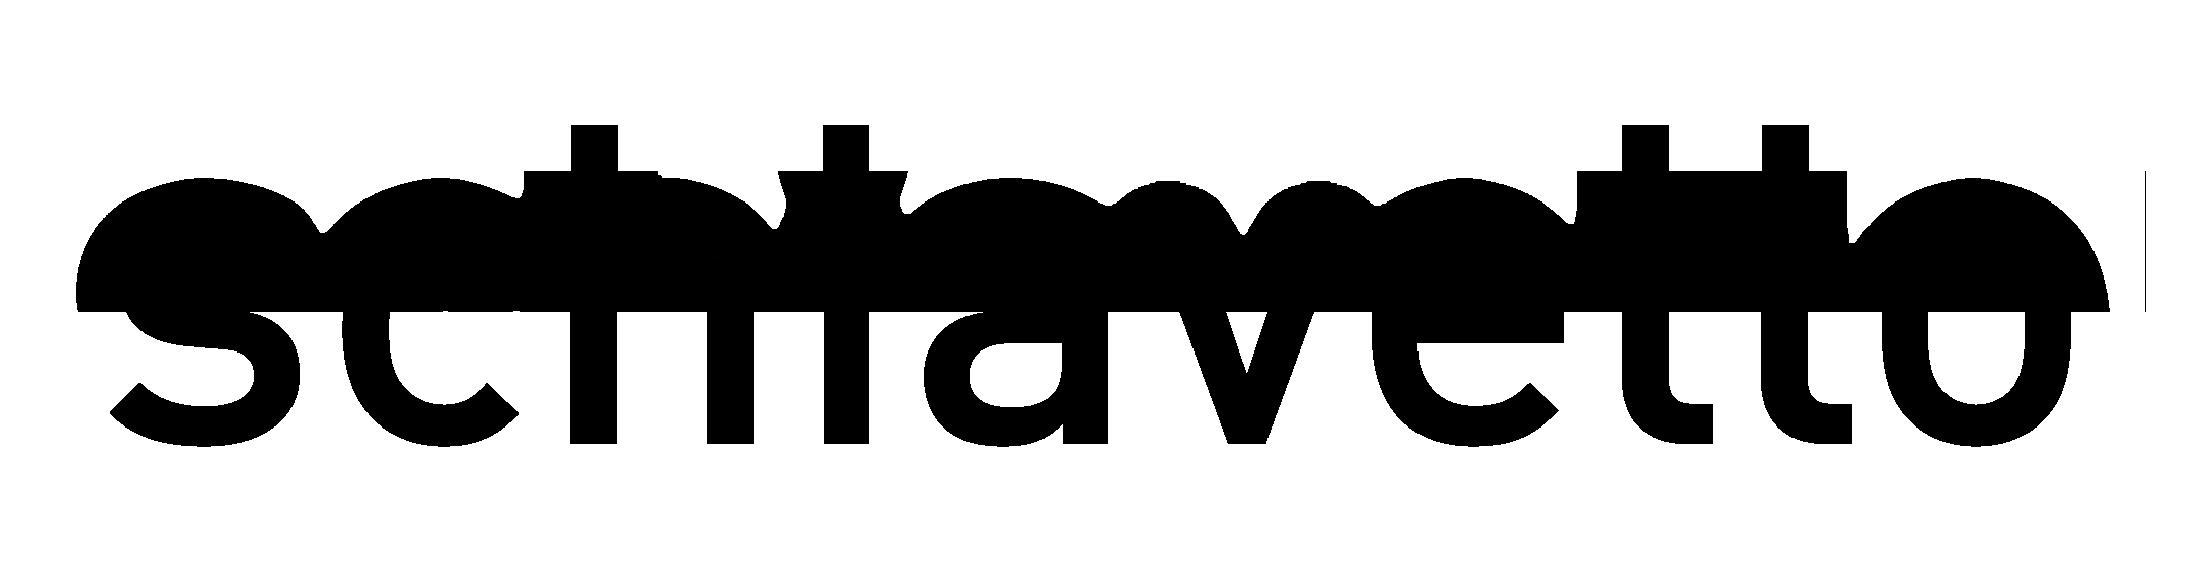 BLACK_SCHIAVELLO_LOGO